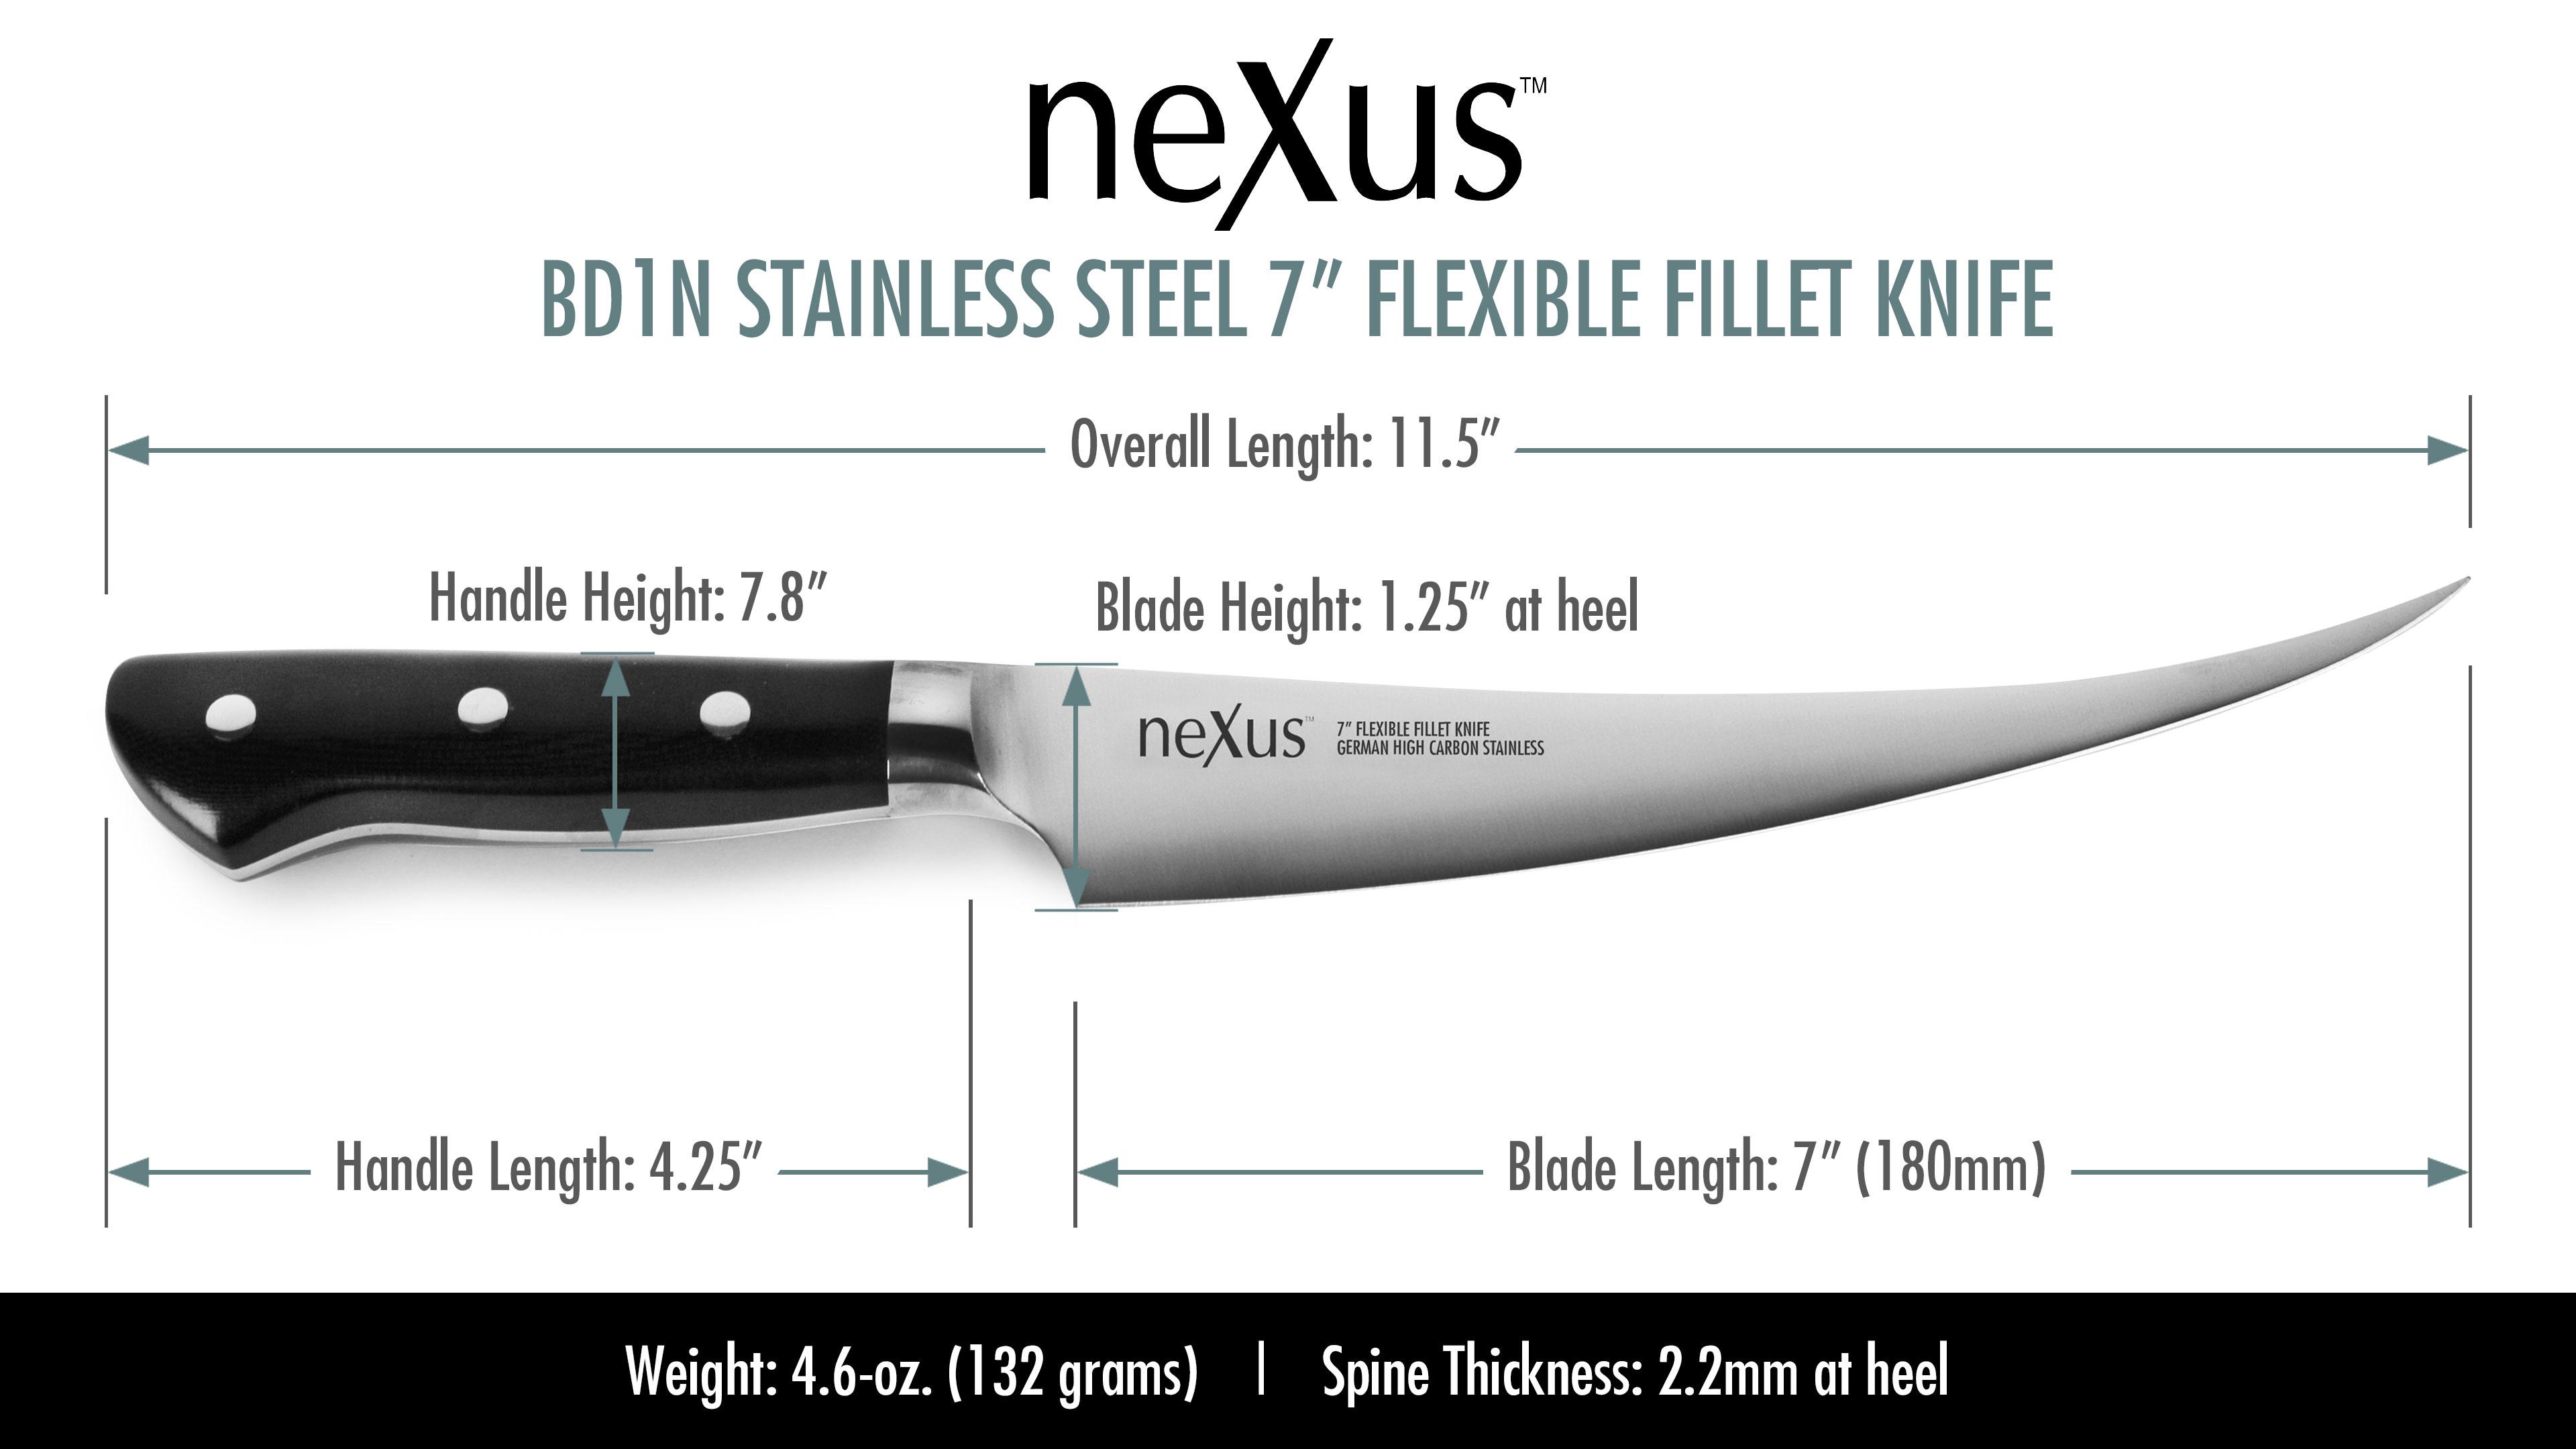 Nexus High Carbon Stainless Steel Flexible Fillet Knife